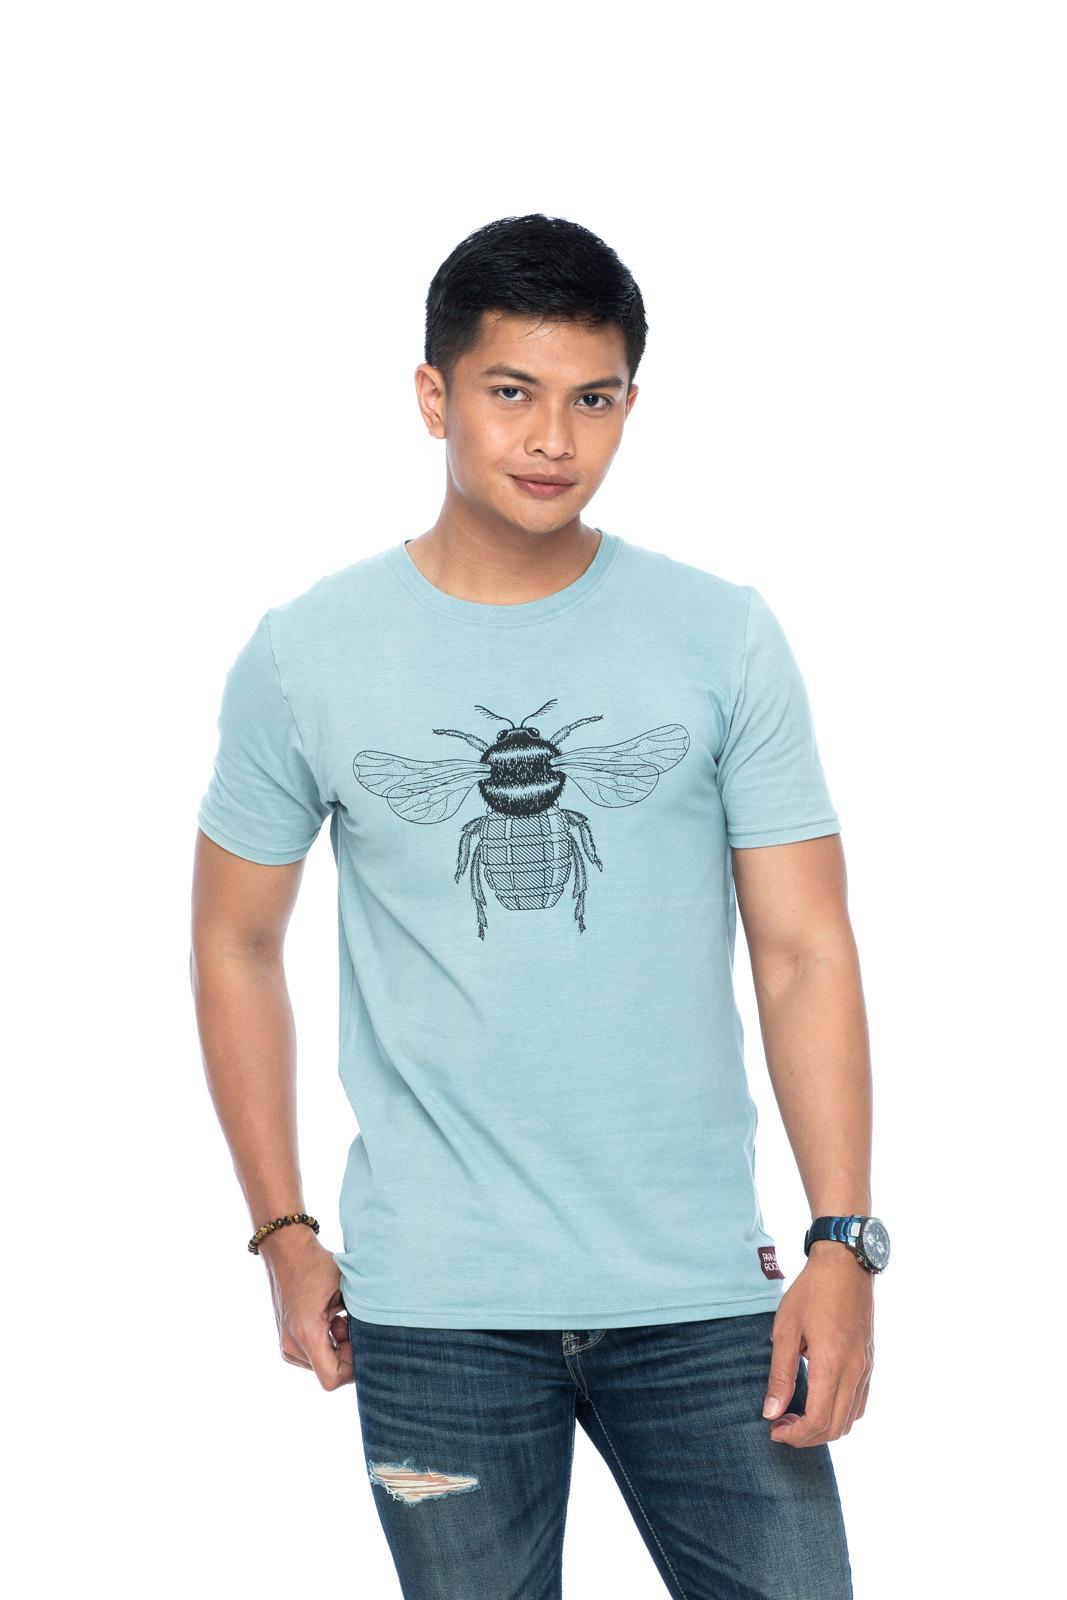 Limited Edition BUMBLEBEE organic t-shirt from PapajaRocks